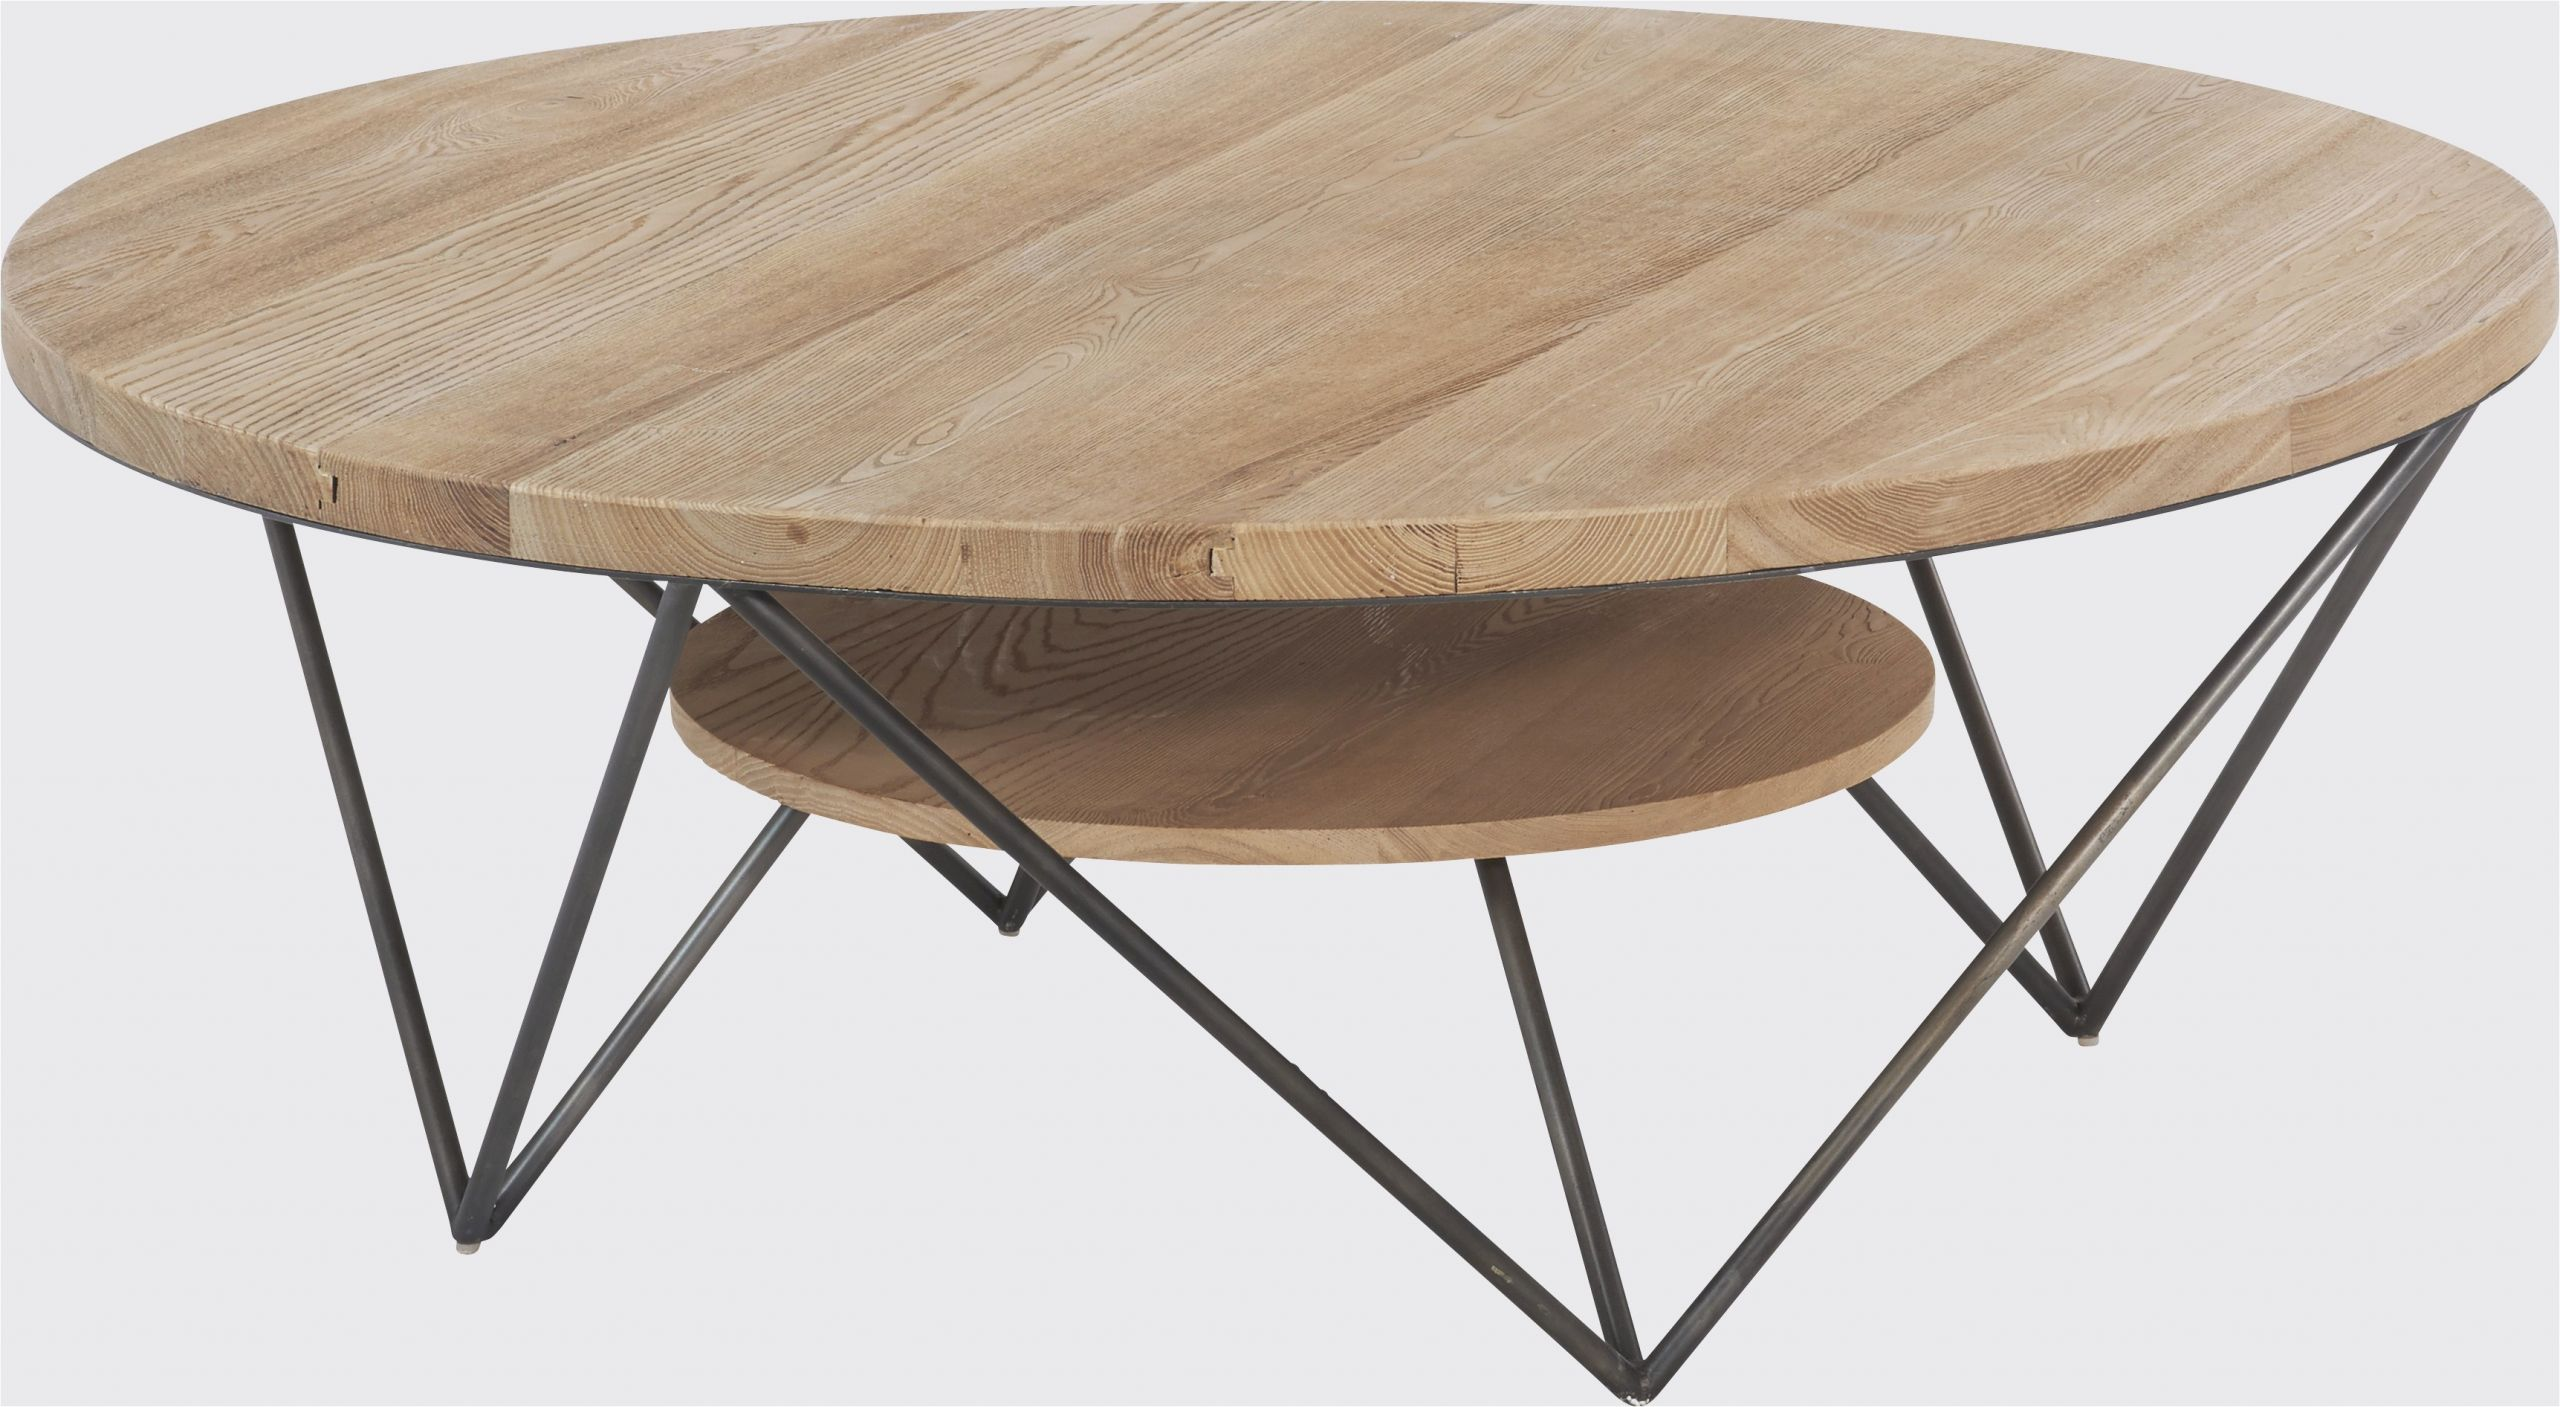 chaise de jardin bois luxe 77 genial table jardin alinea de chaise de jardin bois scaled